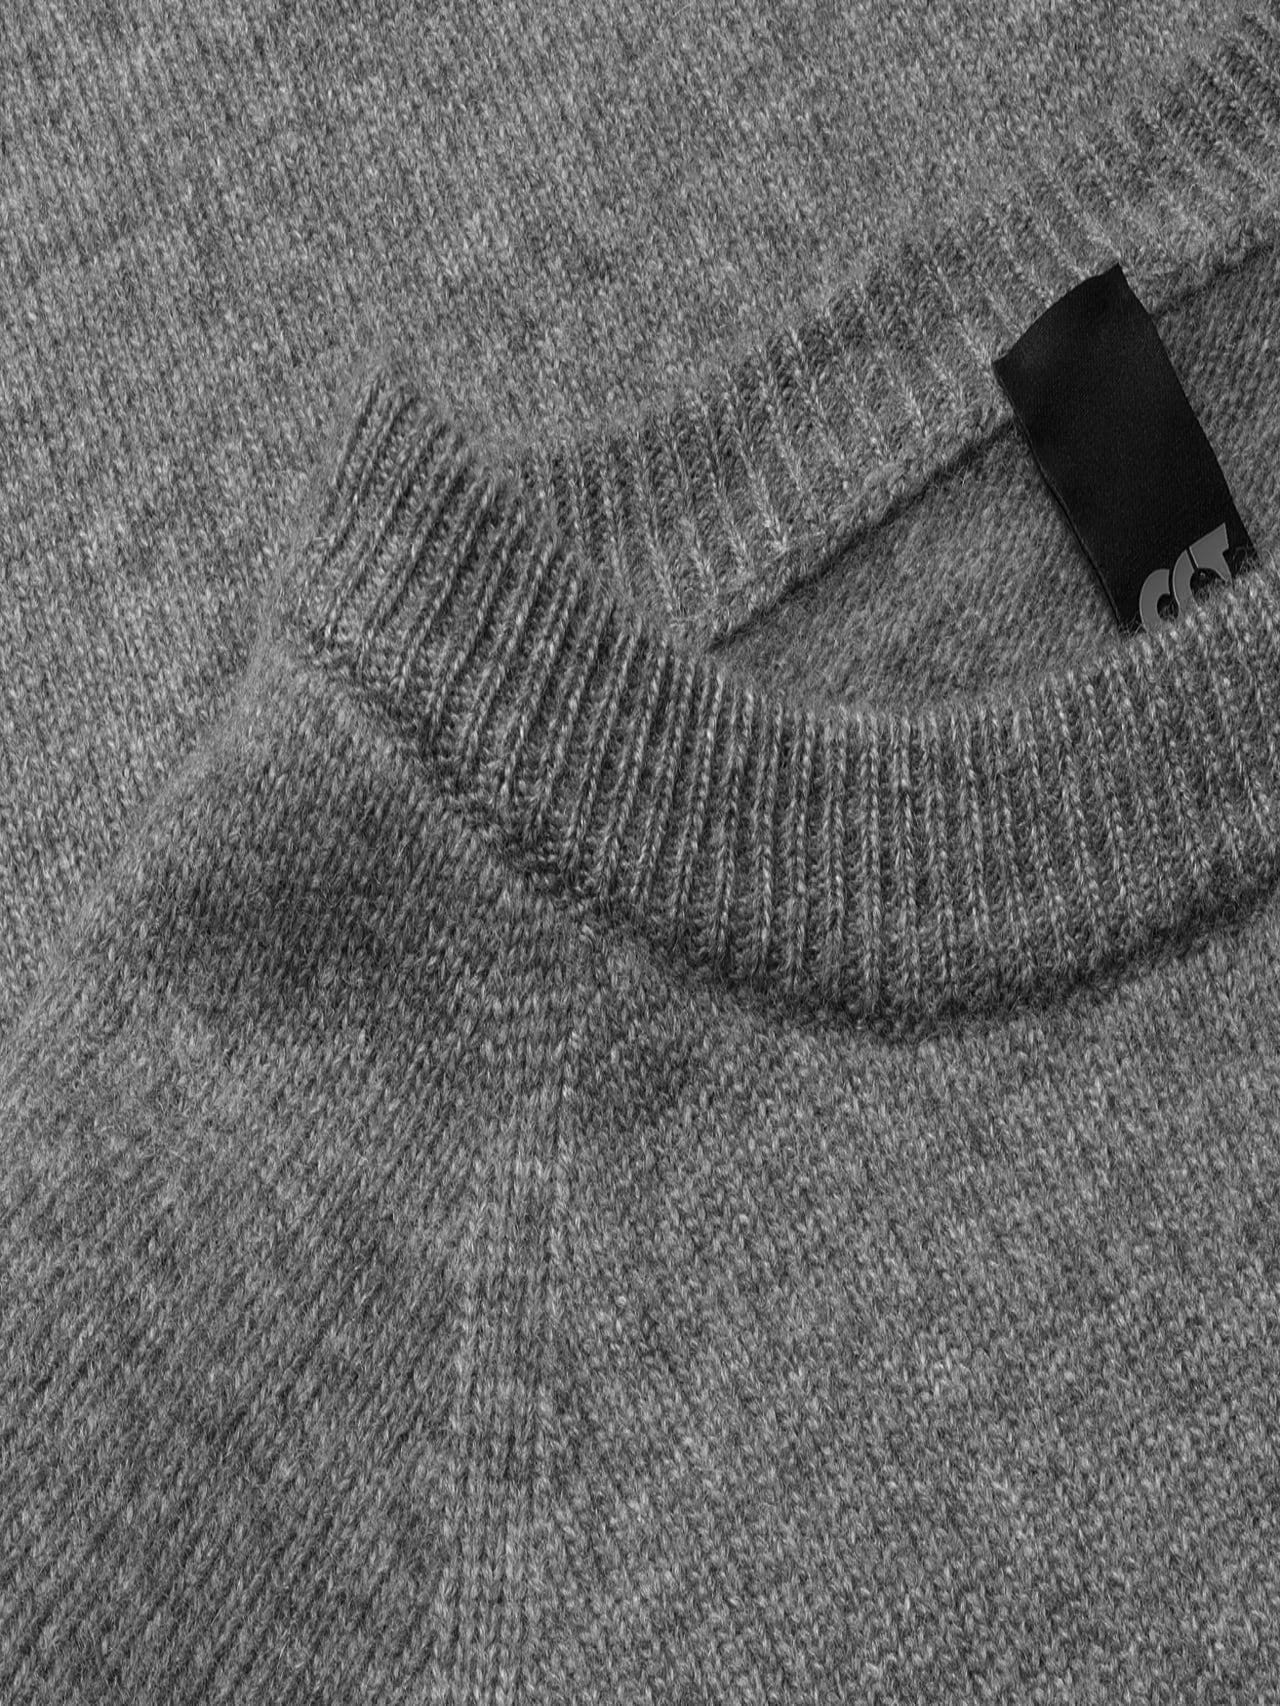 FLACK V2.Y4.02 Nahtloser 3D Knit Merino-Kaschmir Pullover Grau / Melange Extra Alpha Tauri